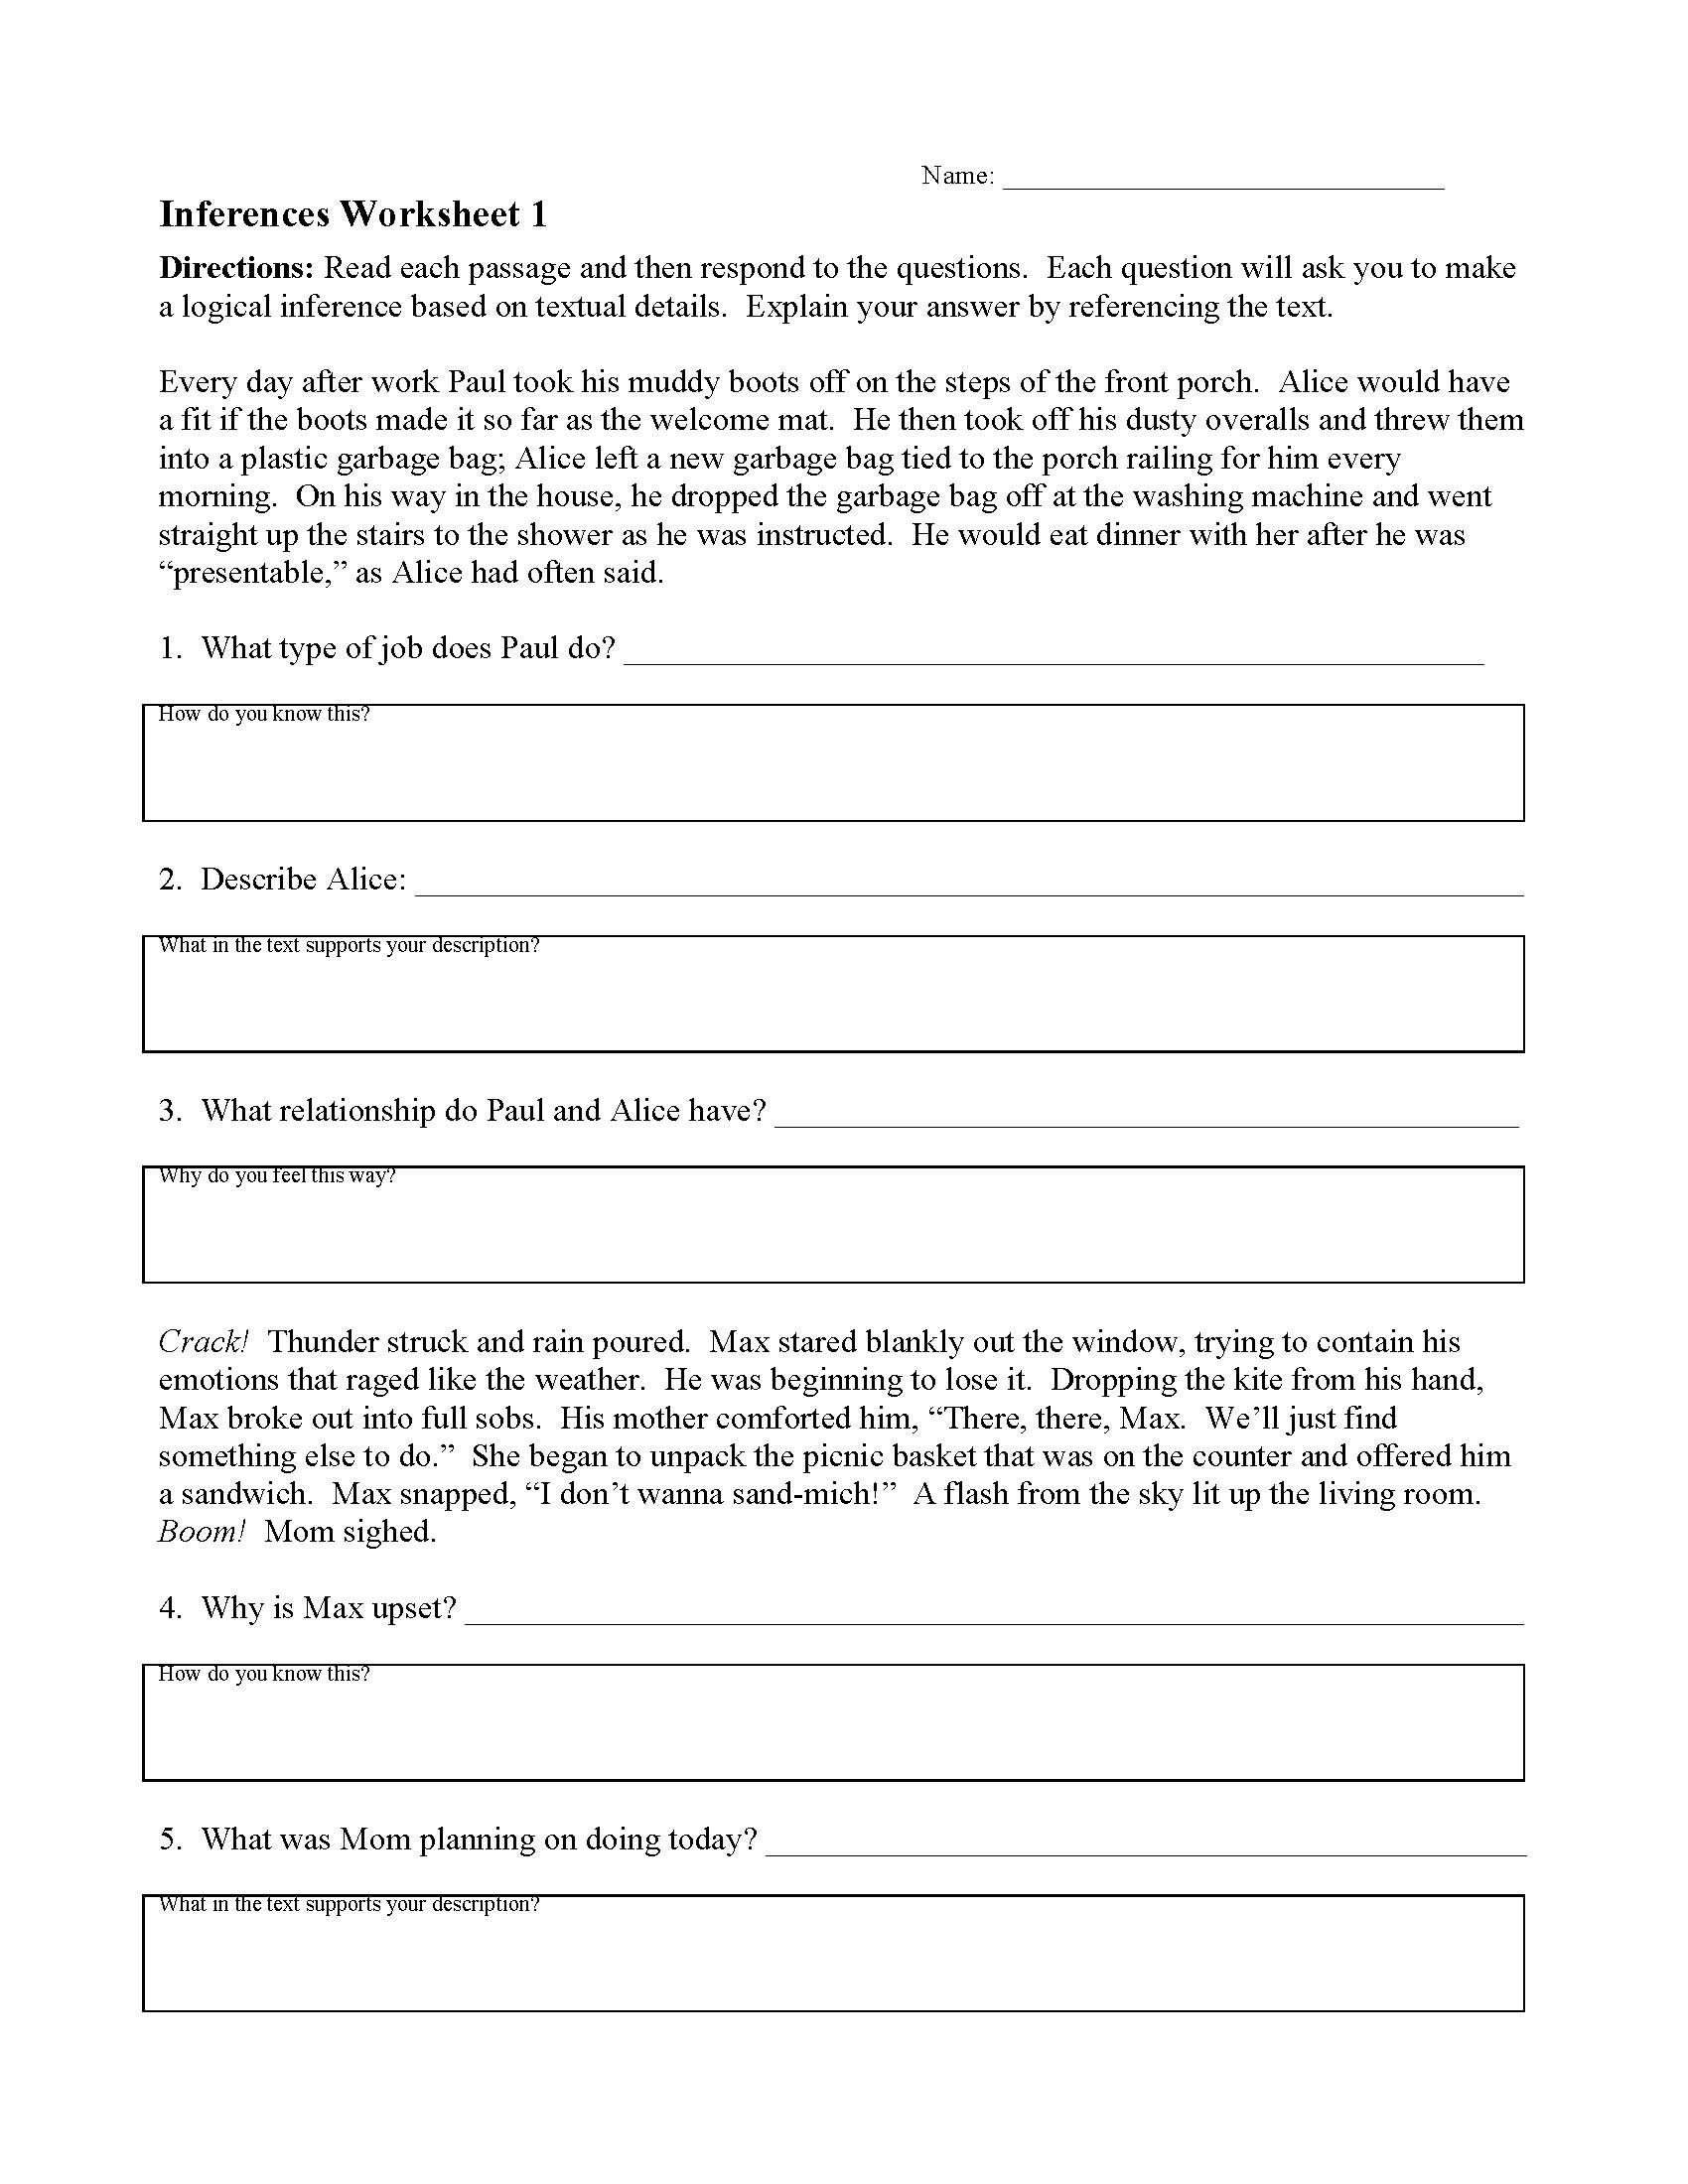 Making Inference Worksheets 4th Grade Inferences Worksheets In 2021 Reading Worksheets Making Inferences Social Studies Worksheets